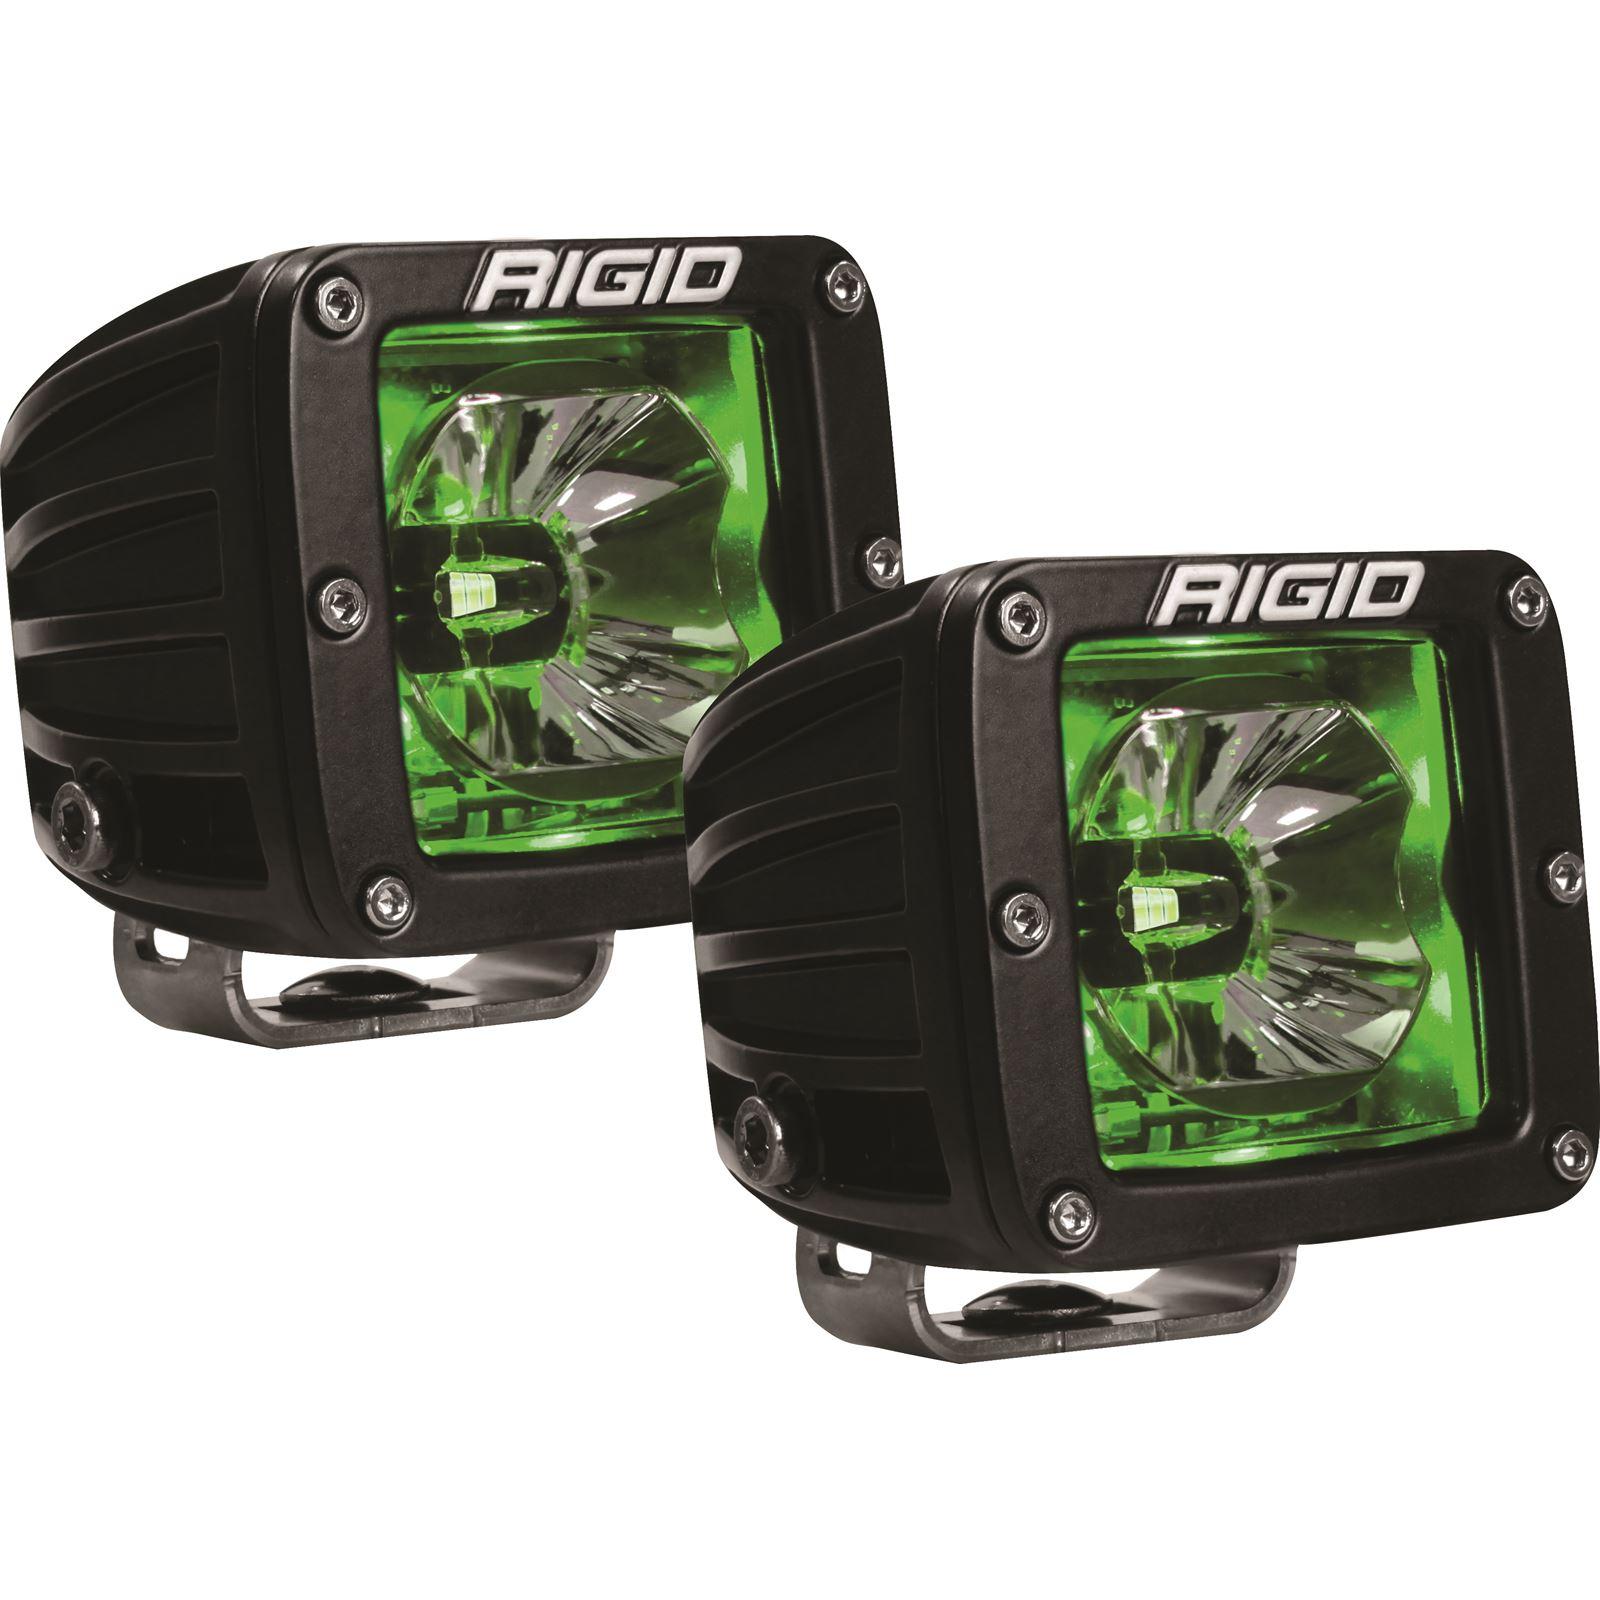 Rigid Radiance Pod Series Light